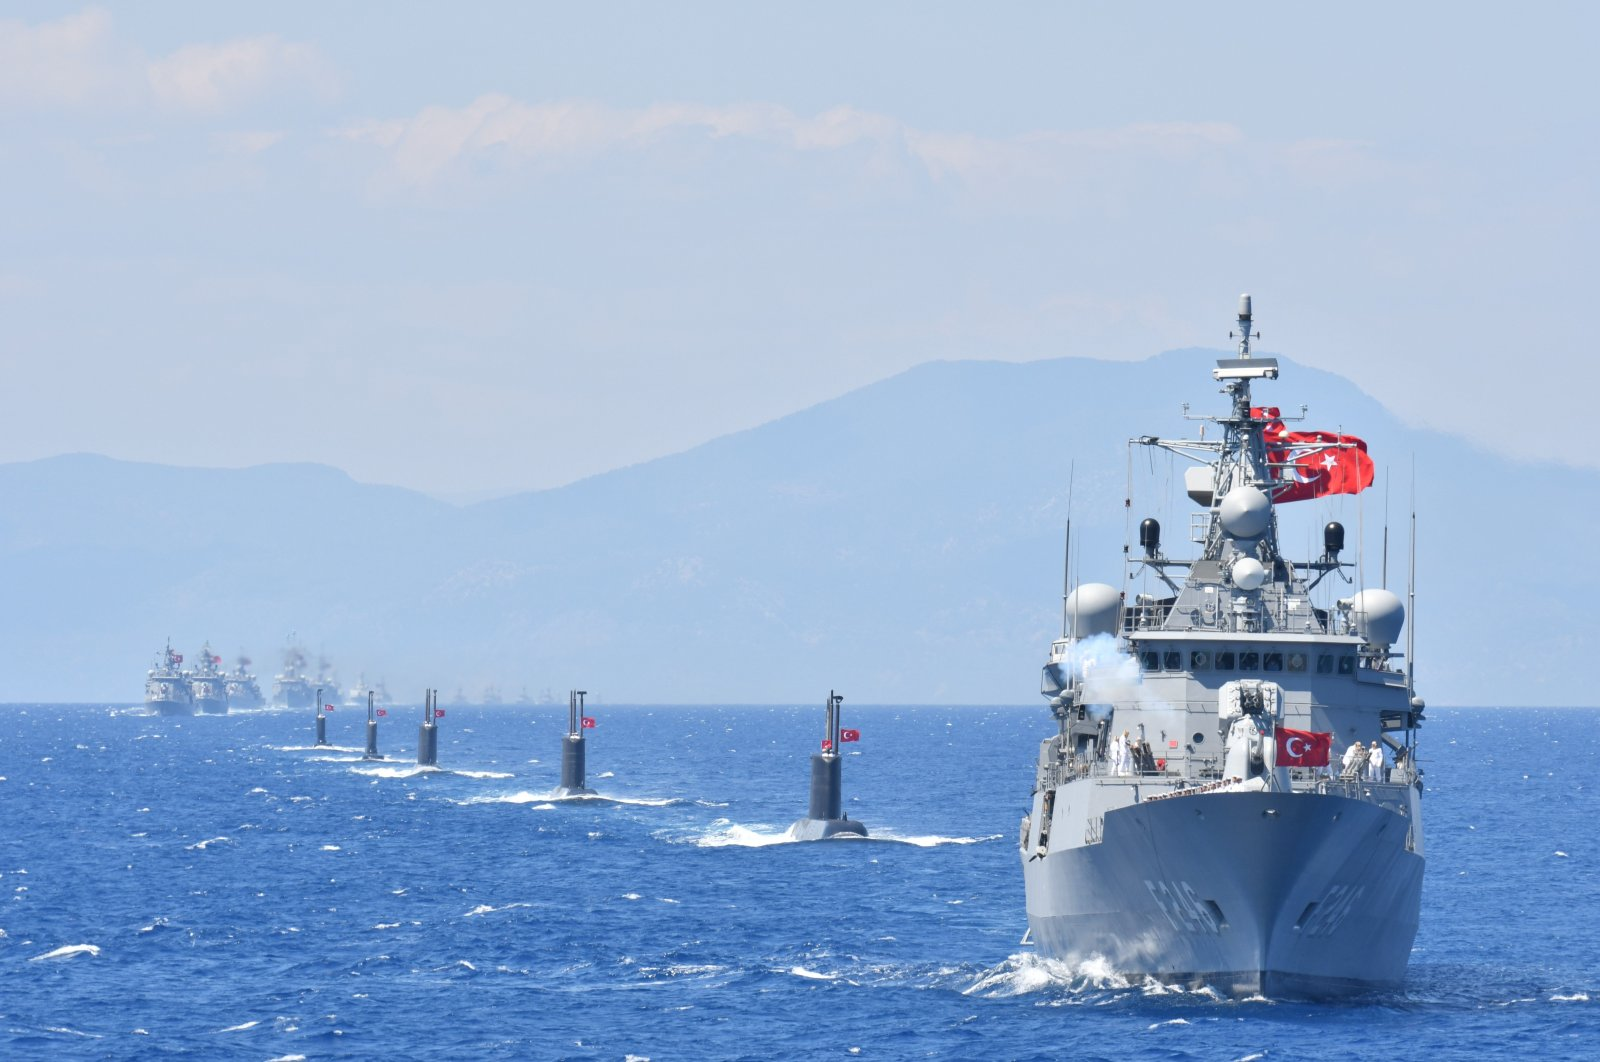 Turkish naval forces conduct training exercises, May 14, 2019. (İHA Photo)